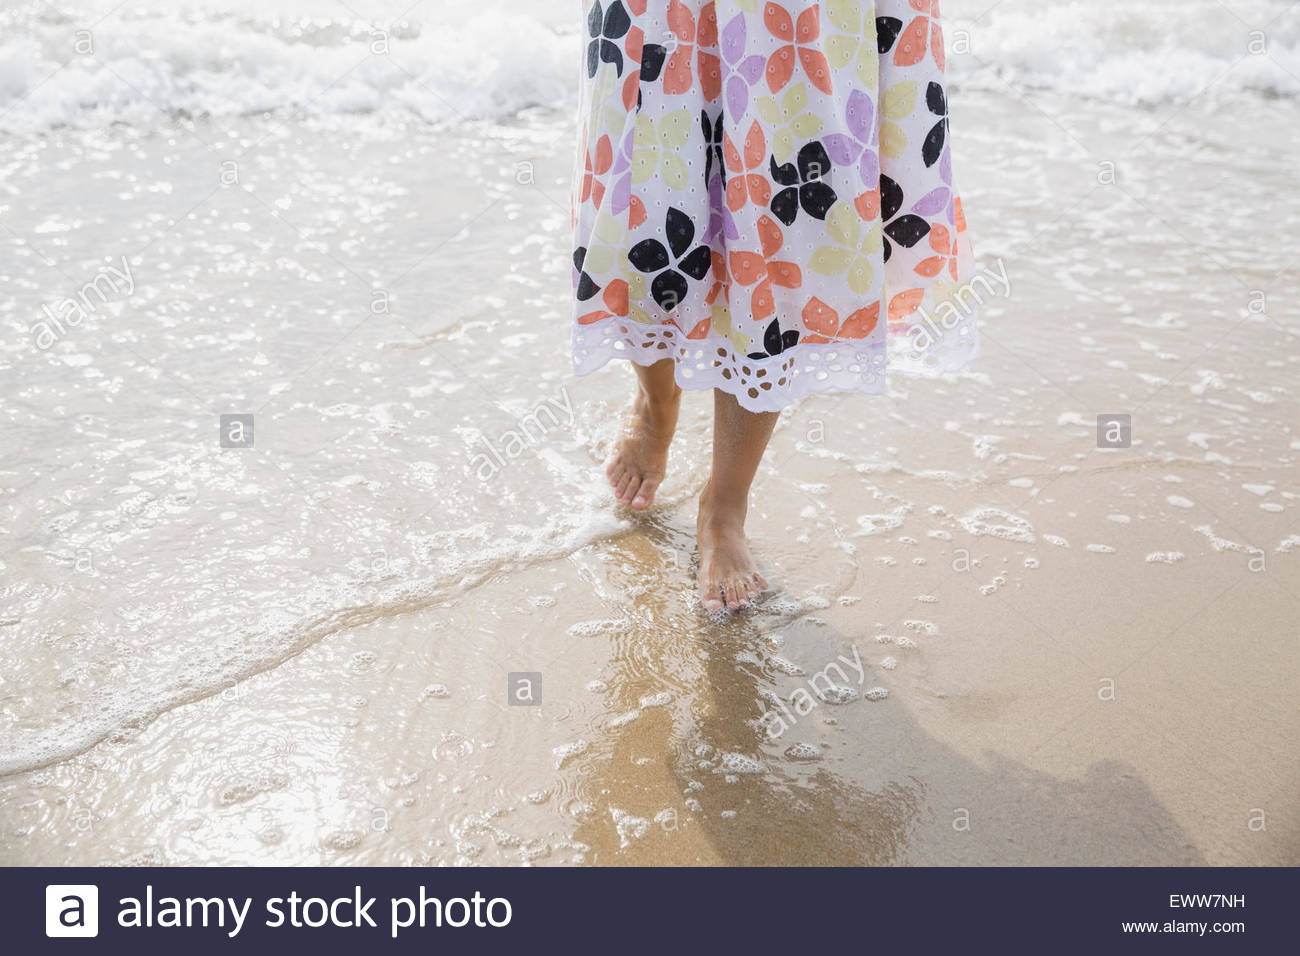 La section basse fille robe soleil pataugeant Océan surf Photo Stock